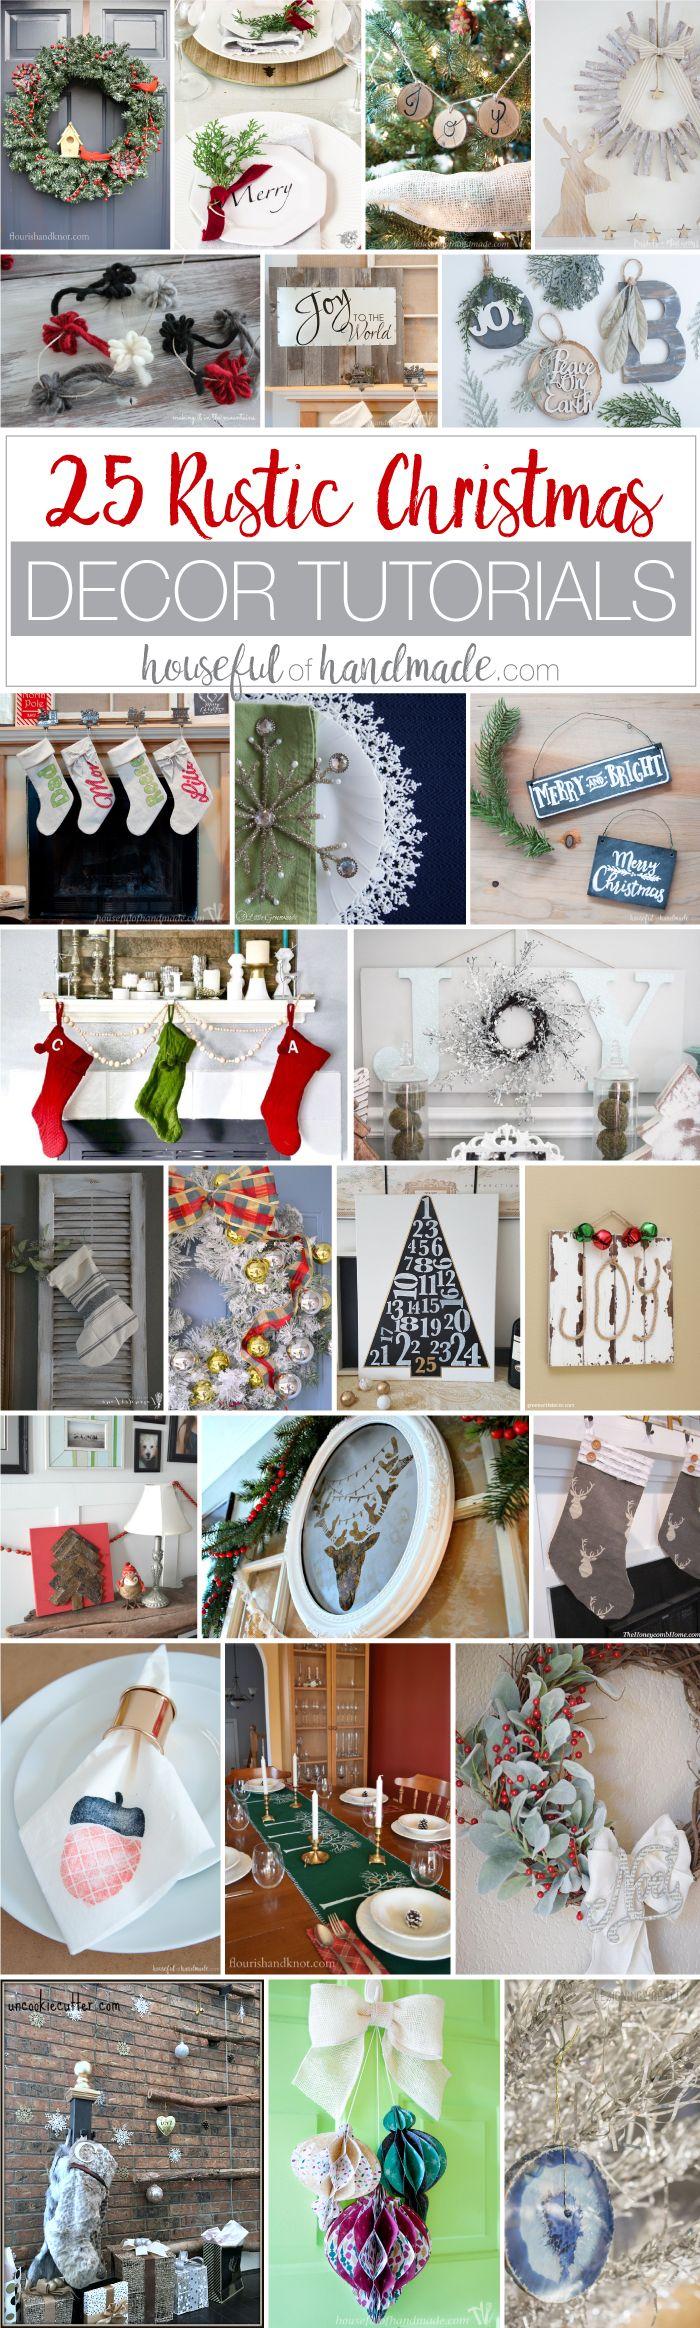 Mrs potts chip christmas decoration - 25 Rustic Christmas Decor Tutorials